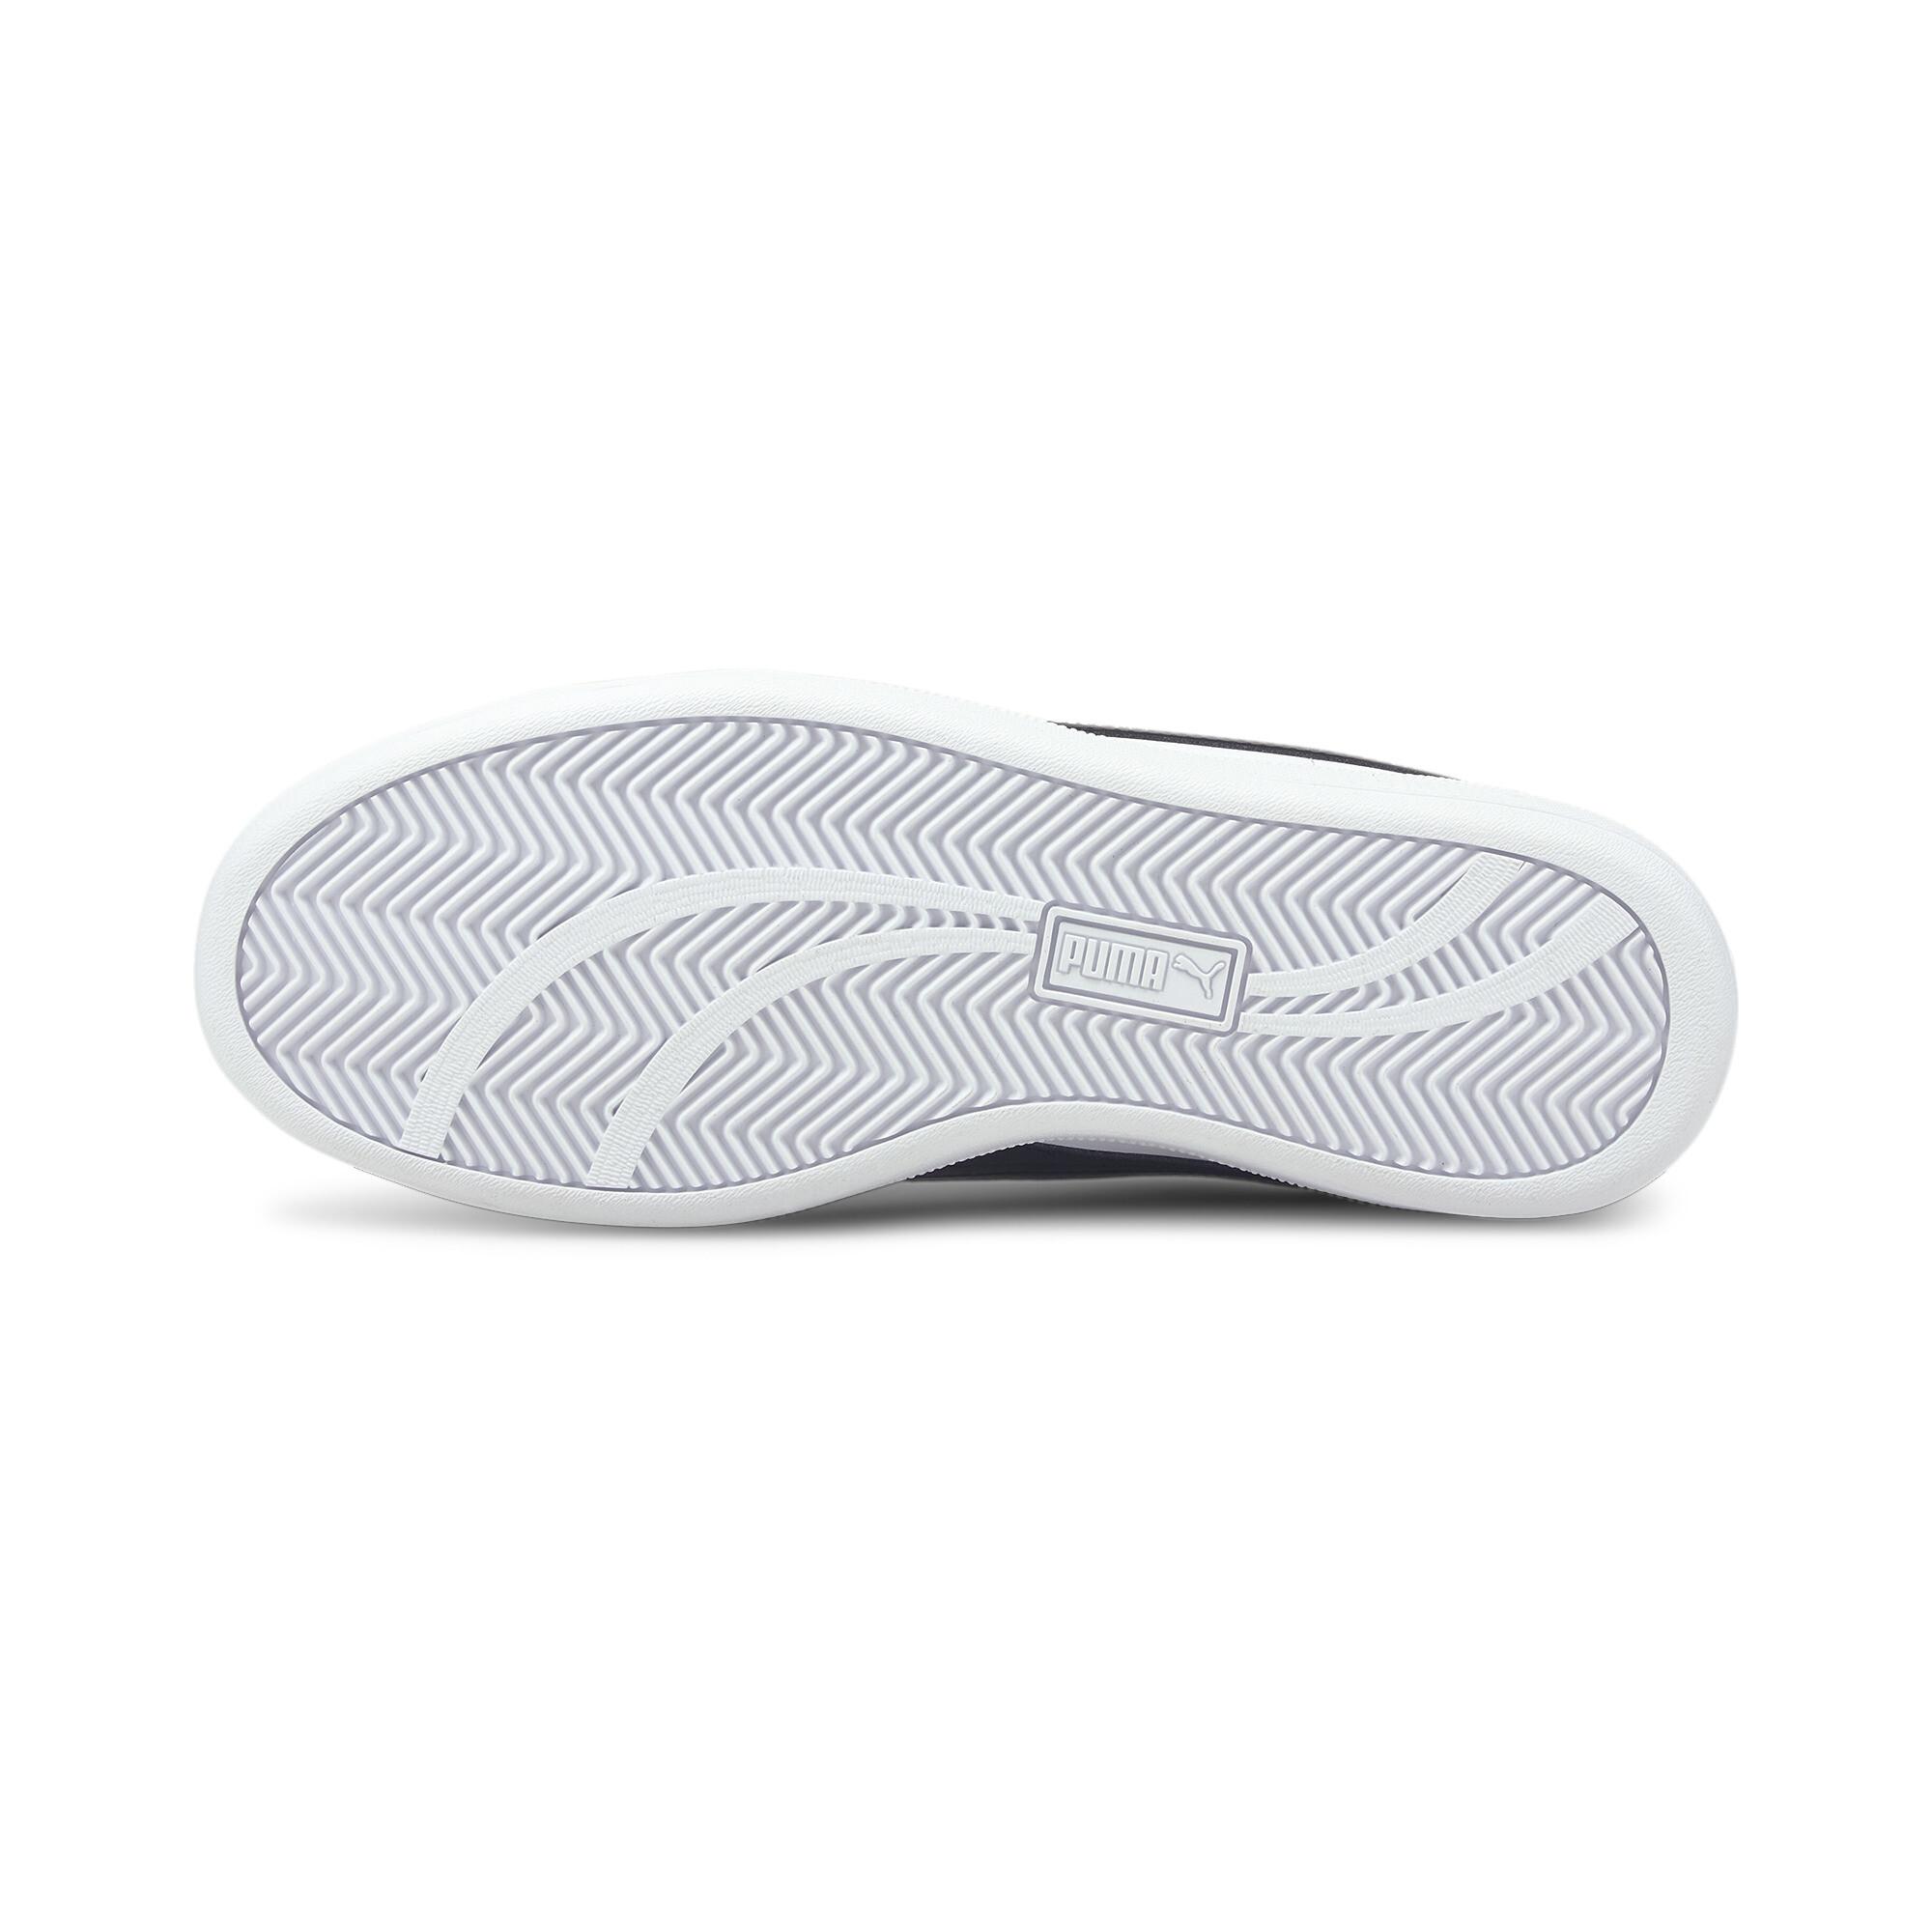 PUMA-Smash-Trainers-Schuhe-Sneakers-Sport-Classics-Unisex-Neu Indexbild 10